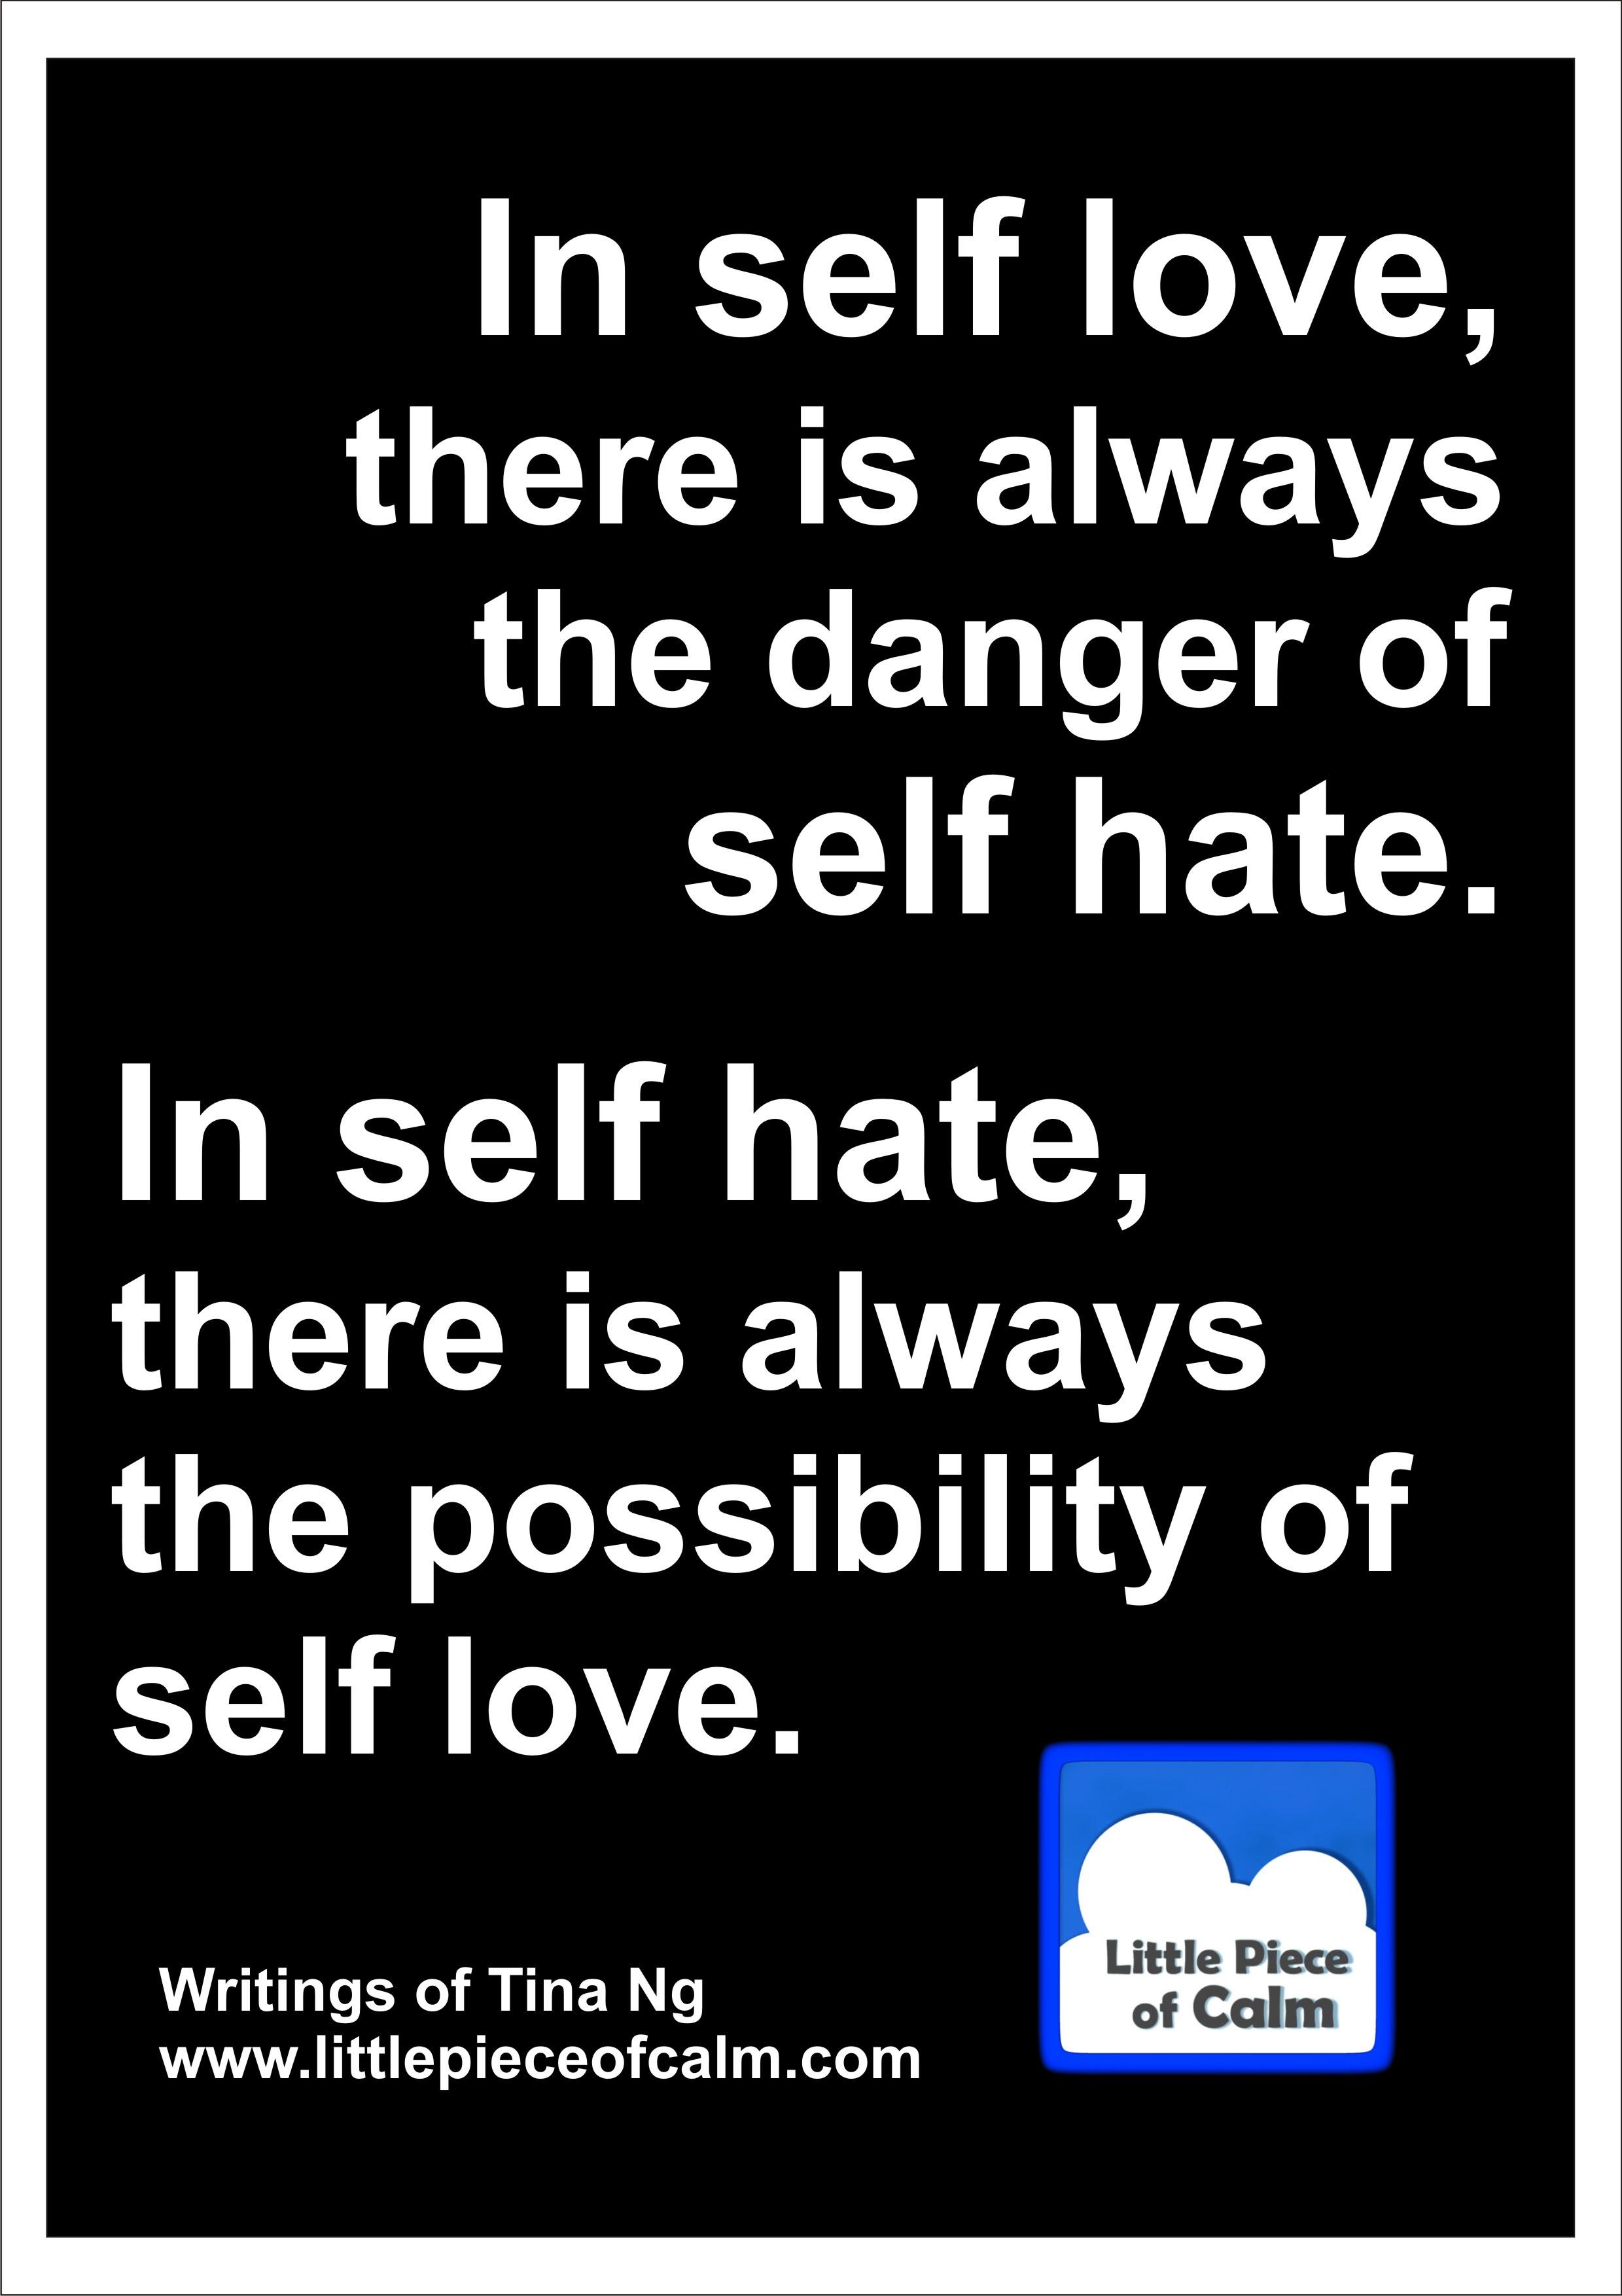 LPC self love and self hate